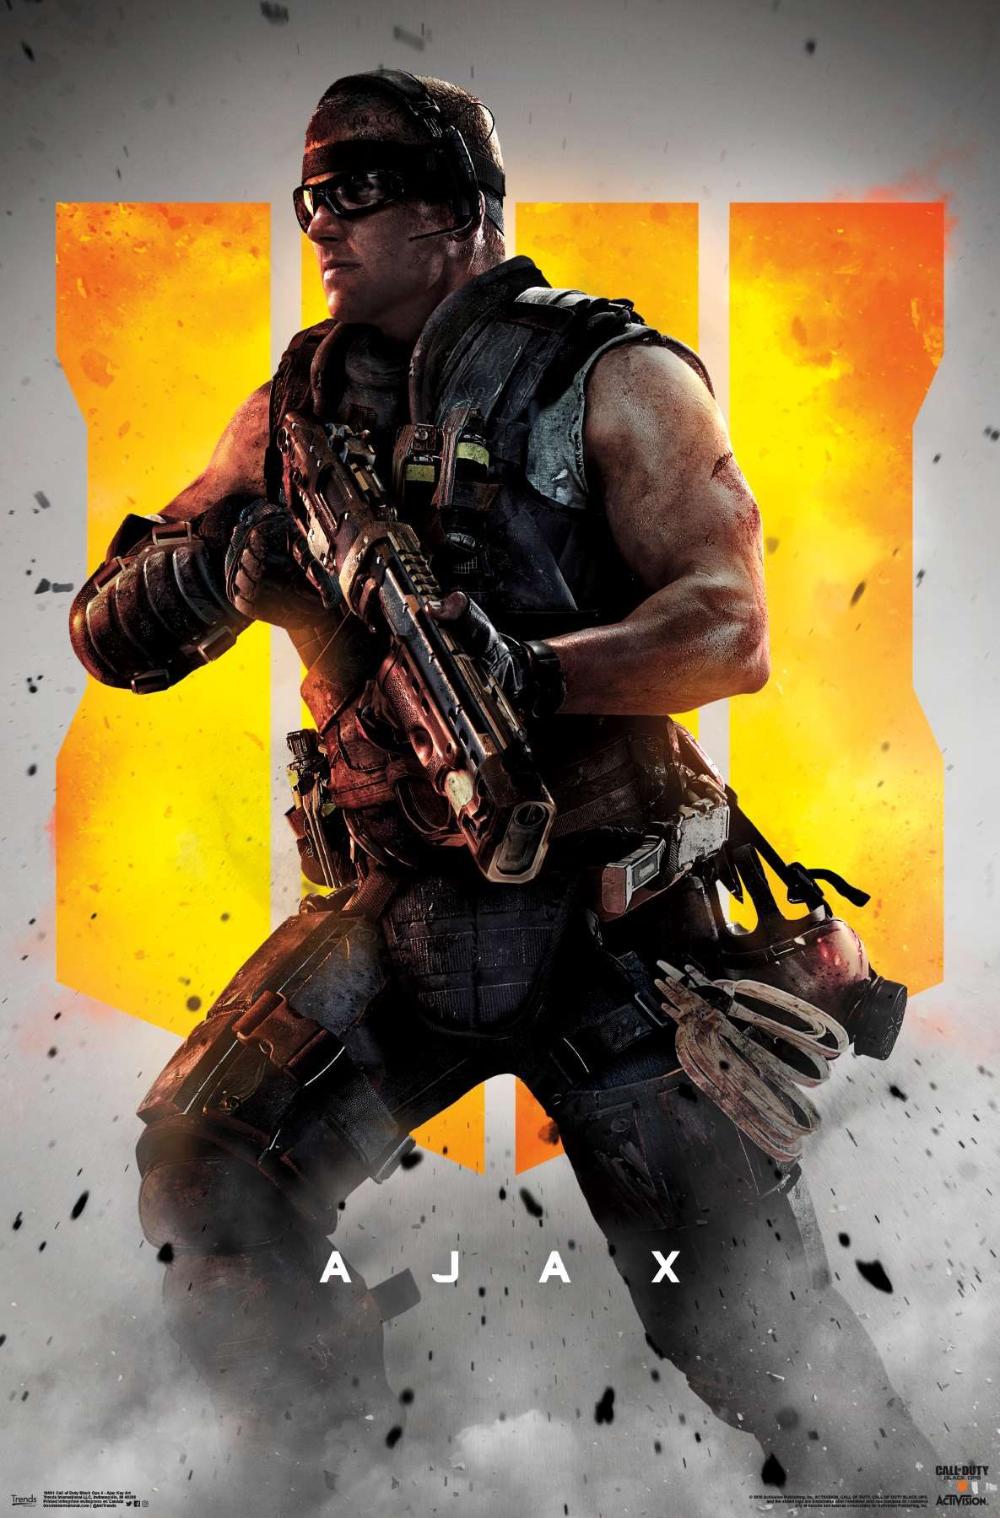 Call Of Duty Black Ops 4 Ajax Key Art Black Ops Black Ops 4 Call Of Duty